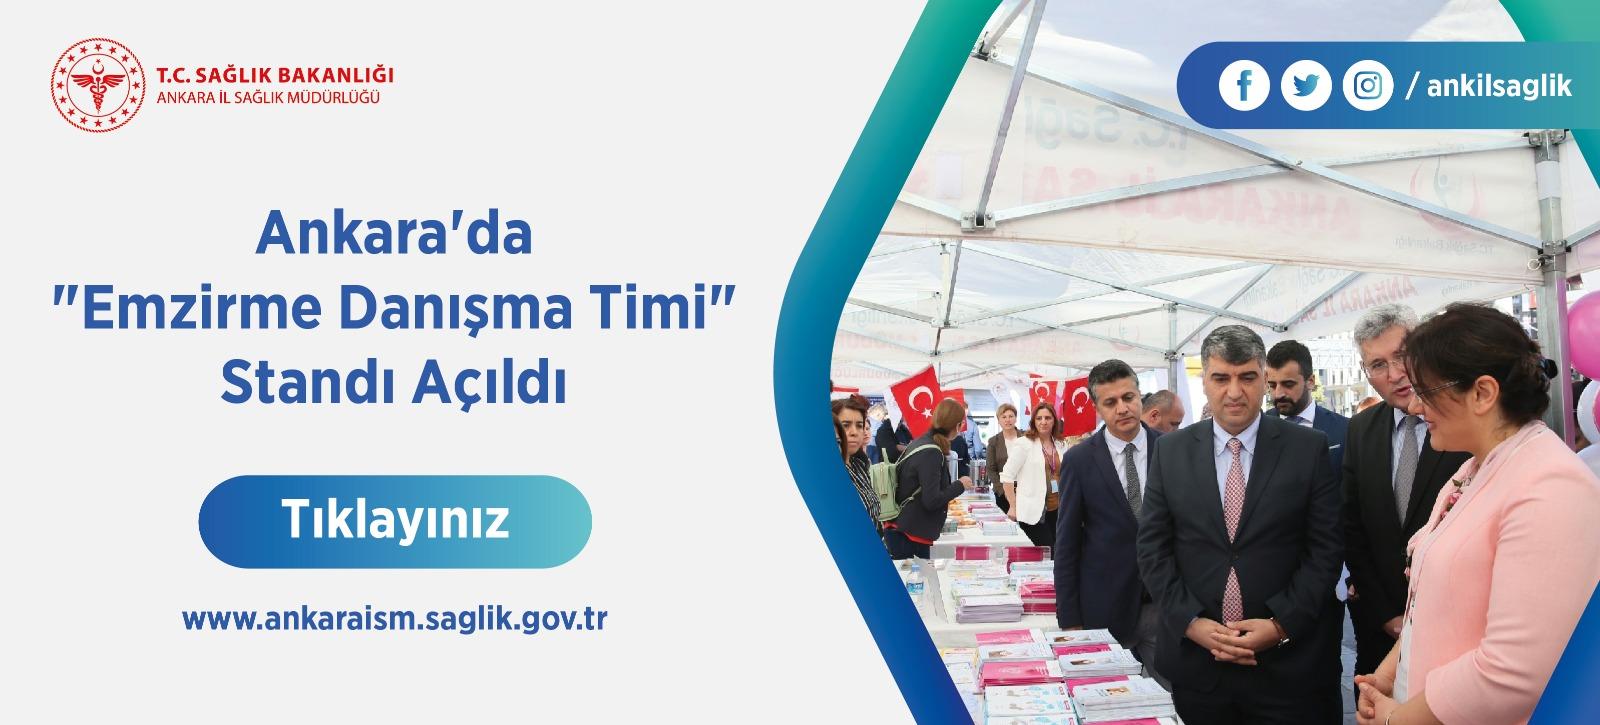 "Ankara'da ""Emzirme Danışma Timi"" Standı Açıldı"